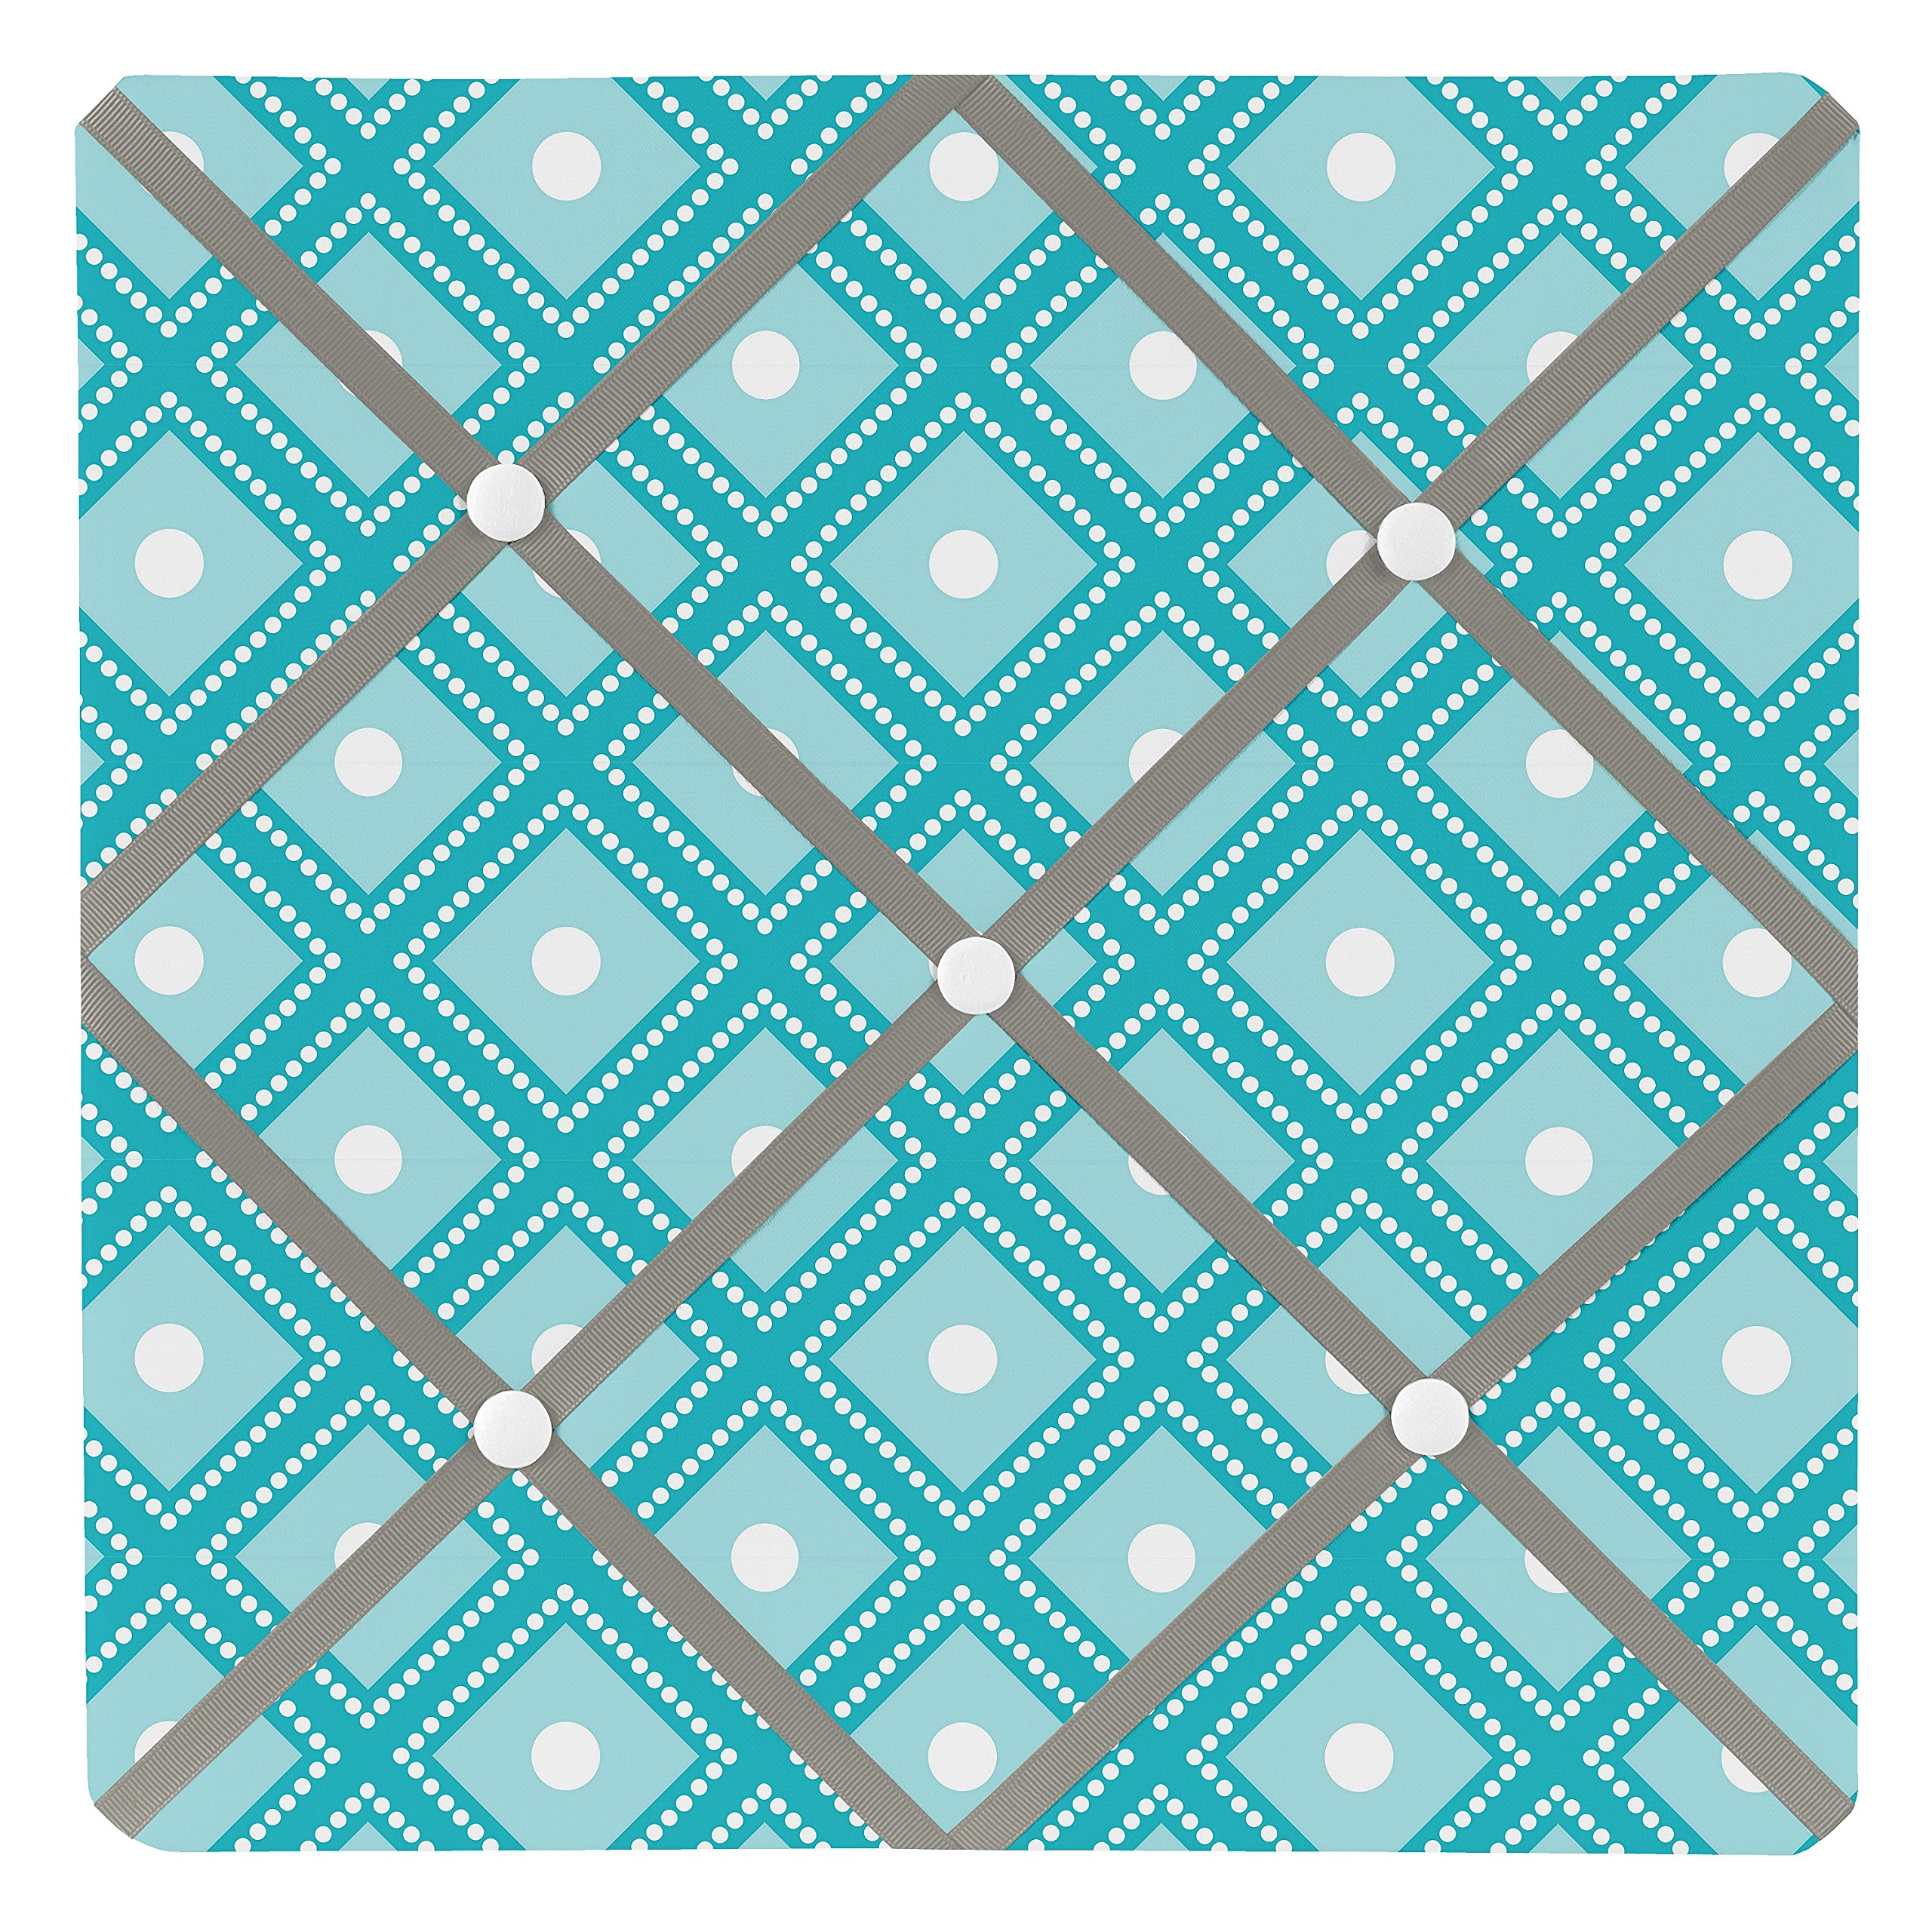 Sweet Jojo Designs Turquoise White and Gray Mod Elephant Fabric Memory/Memo Photo Bulletin Board